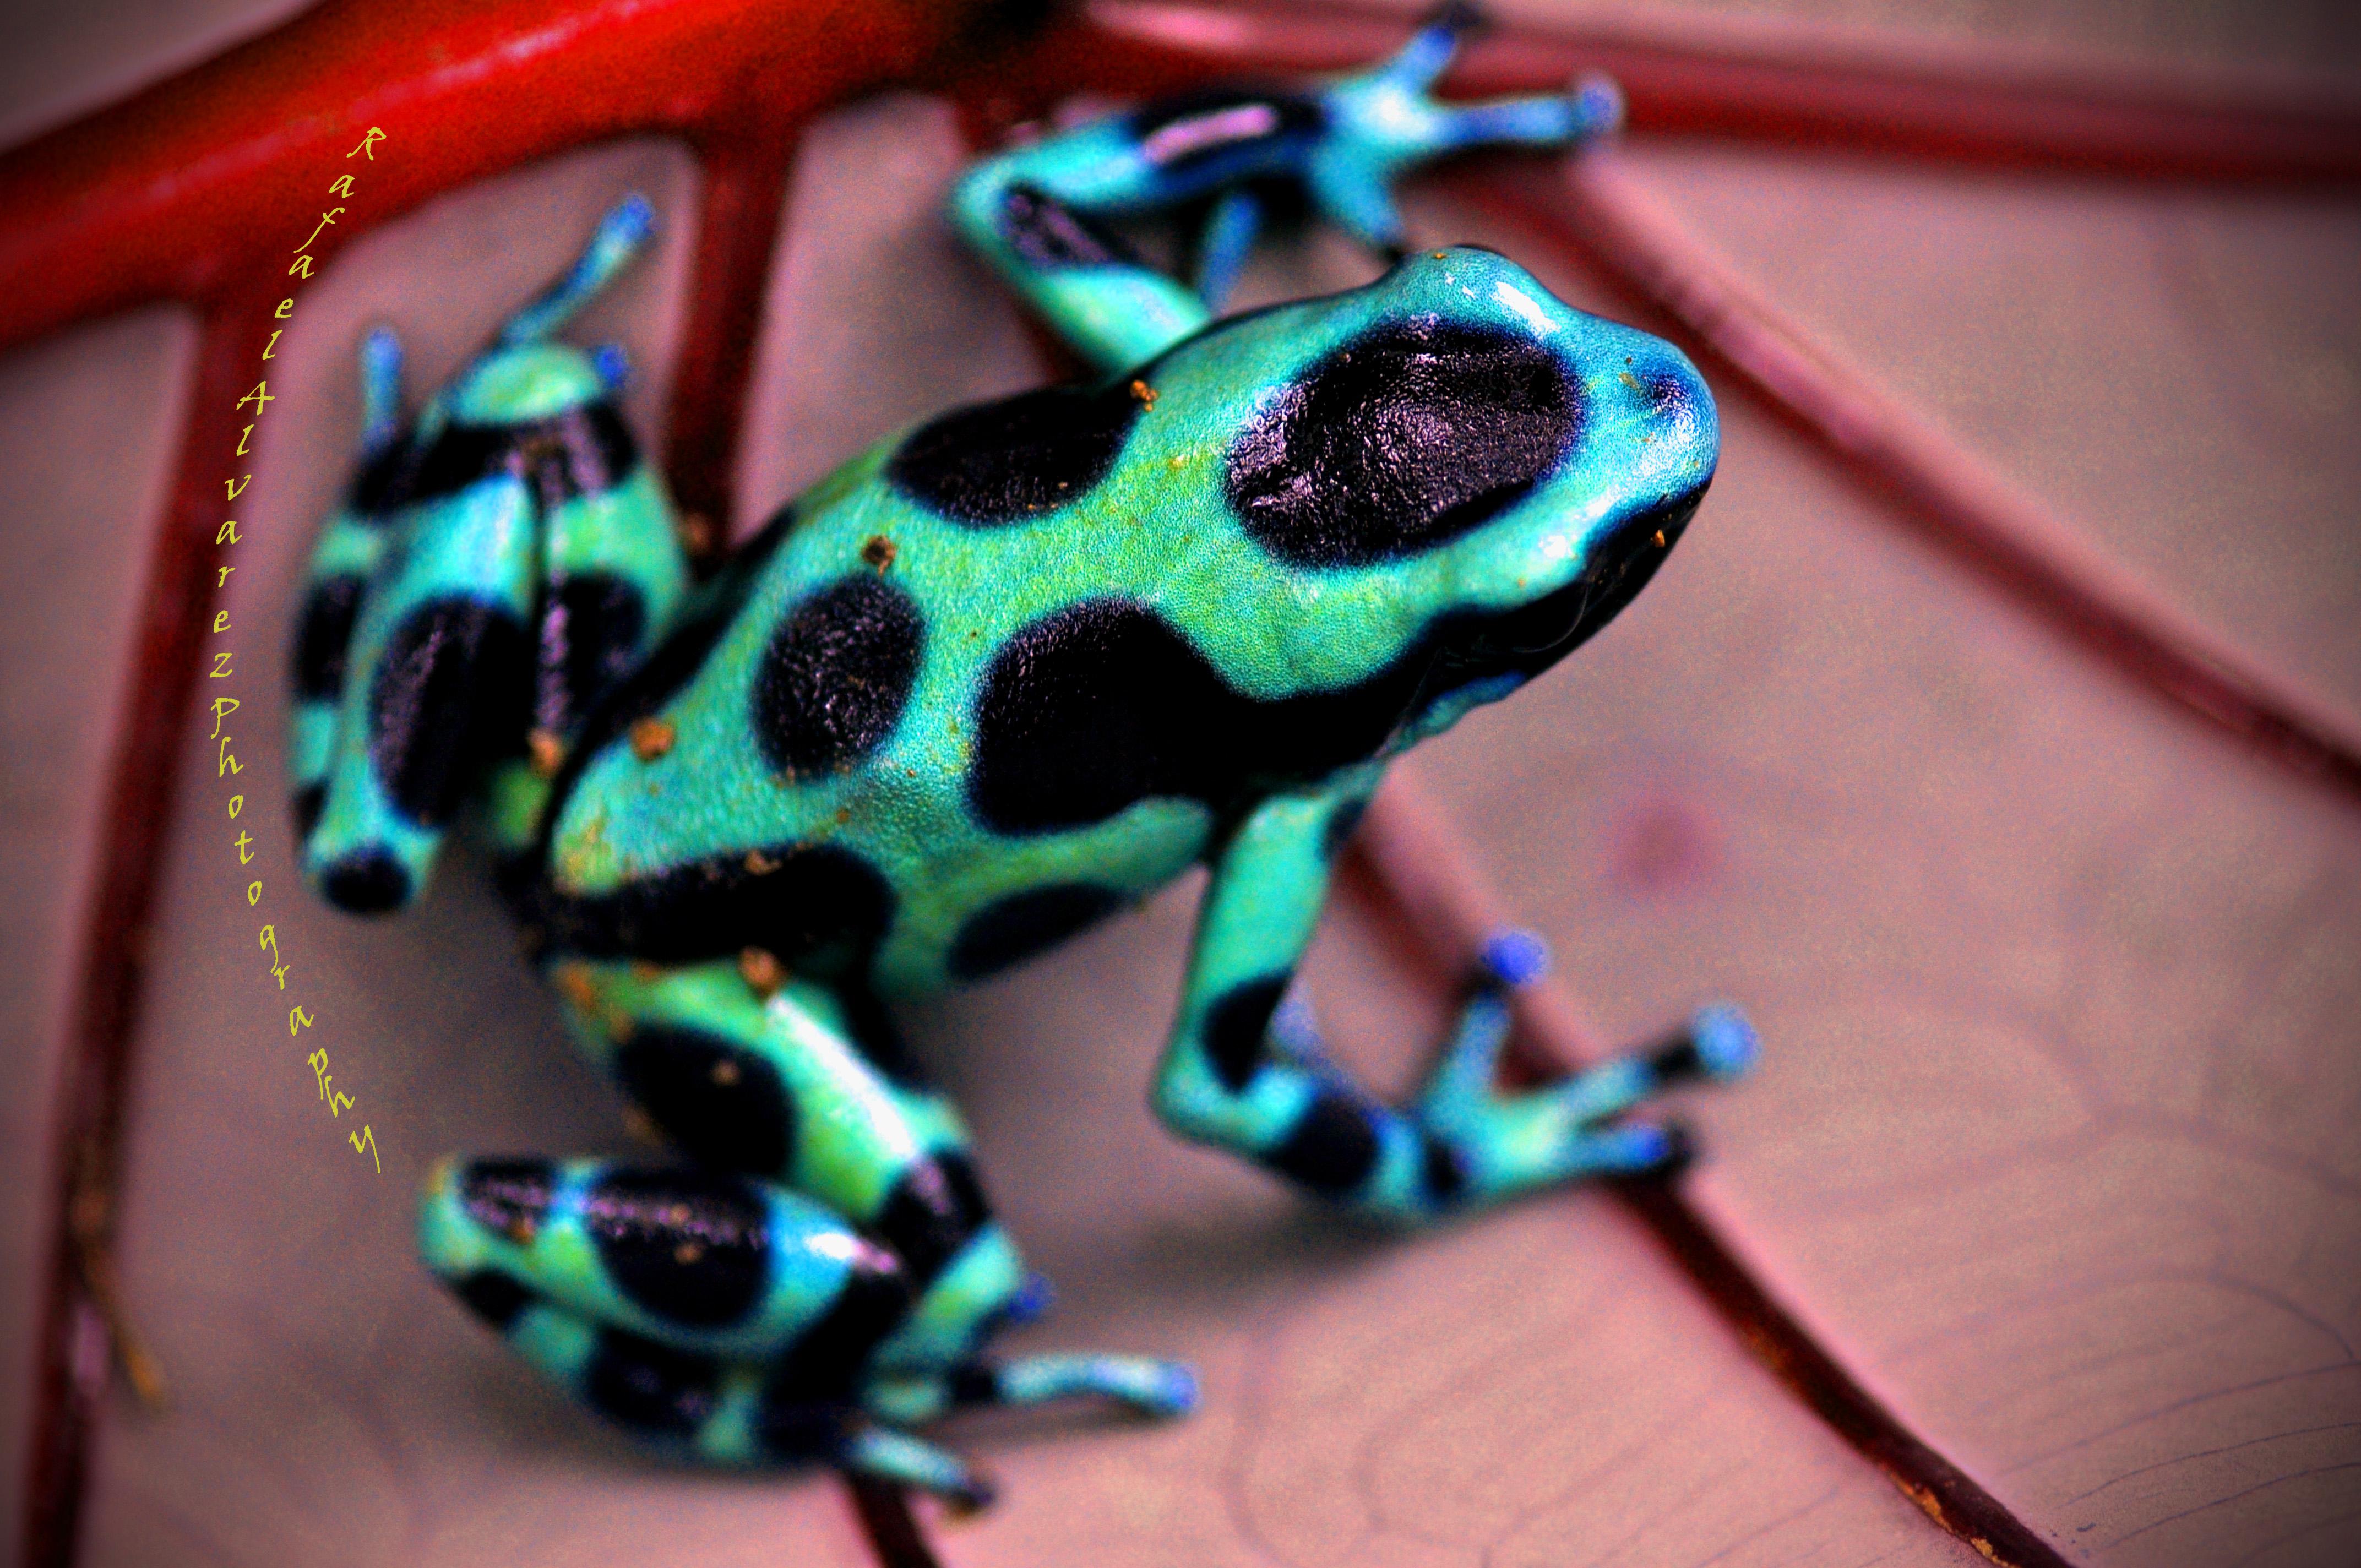 Green Dart Poison Frog - Costa Rica | Flickr - Photo Sharing!